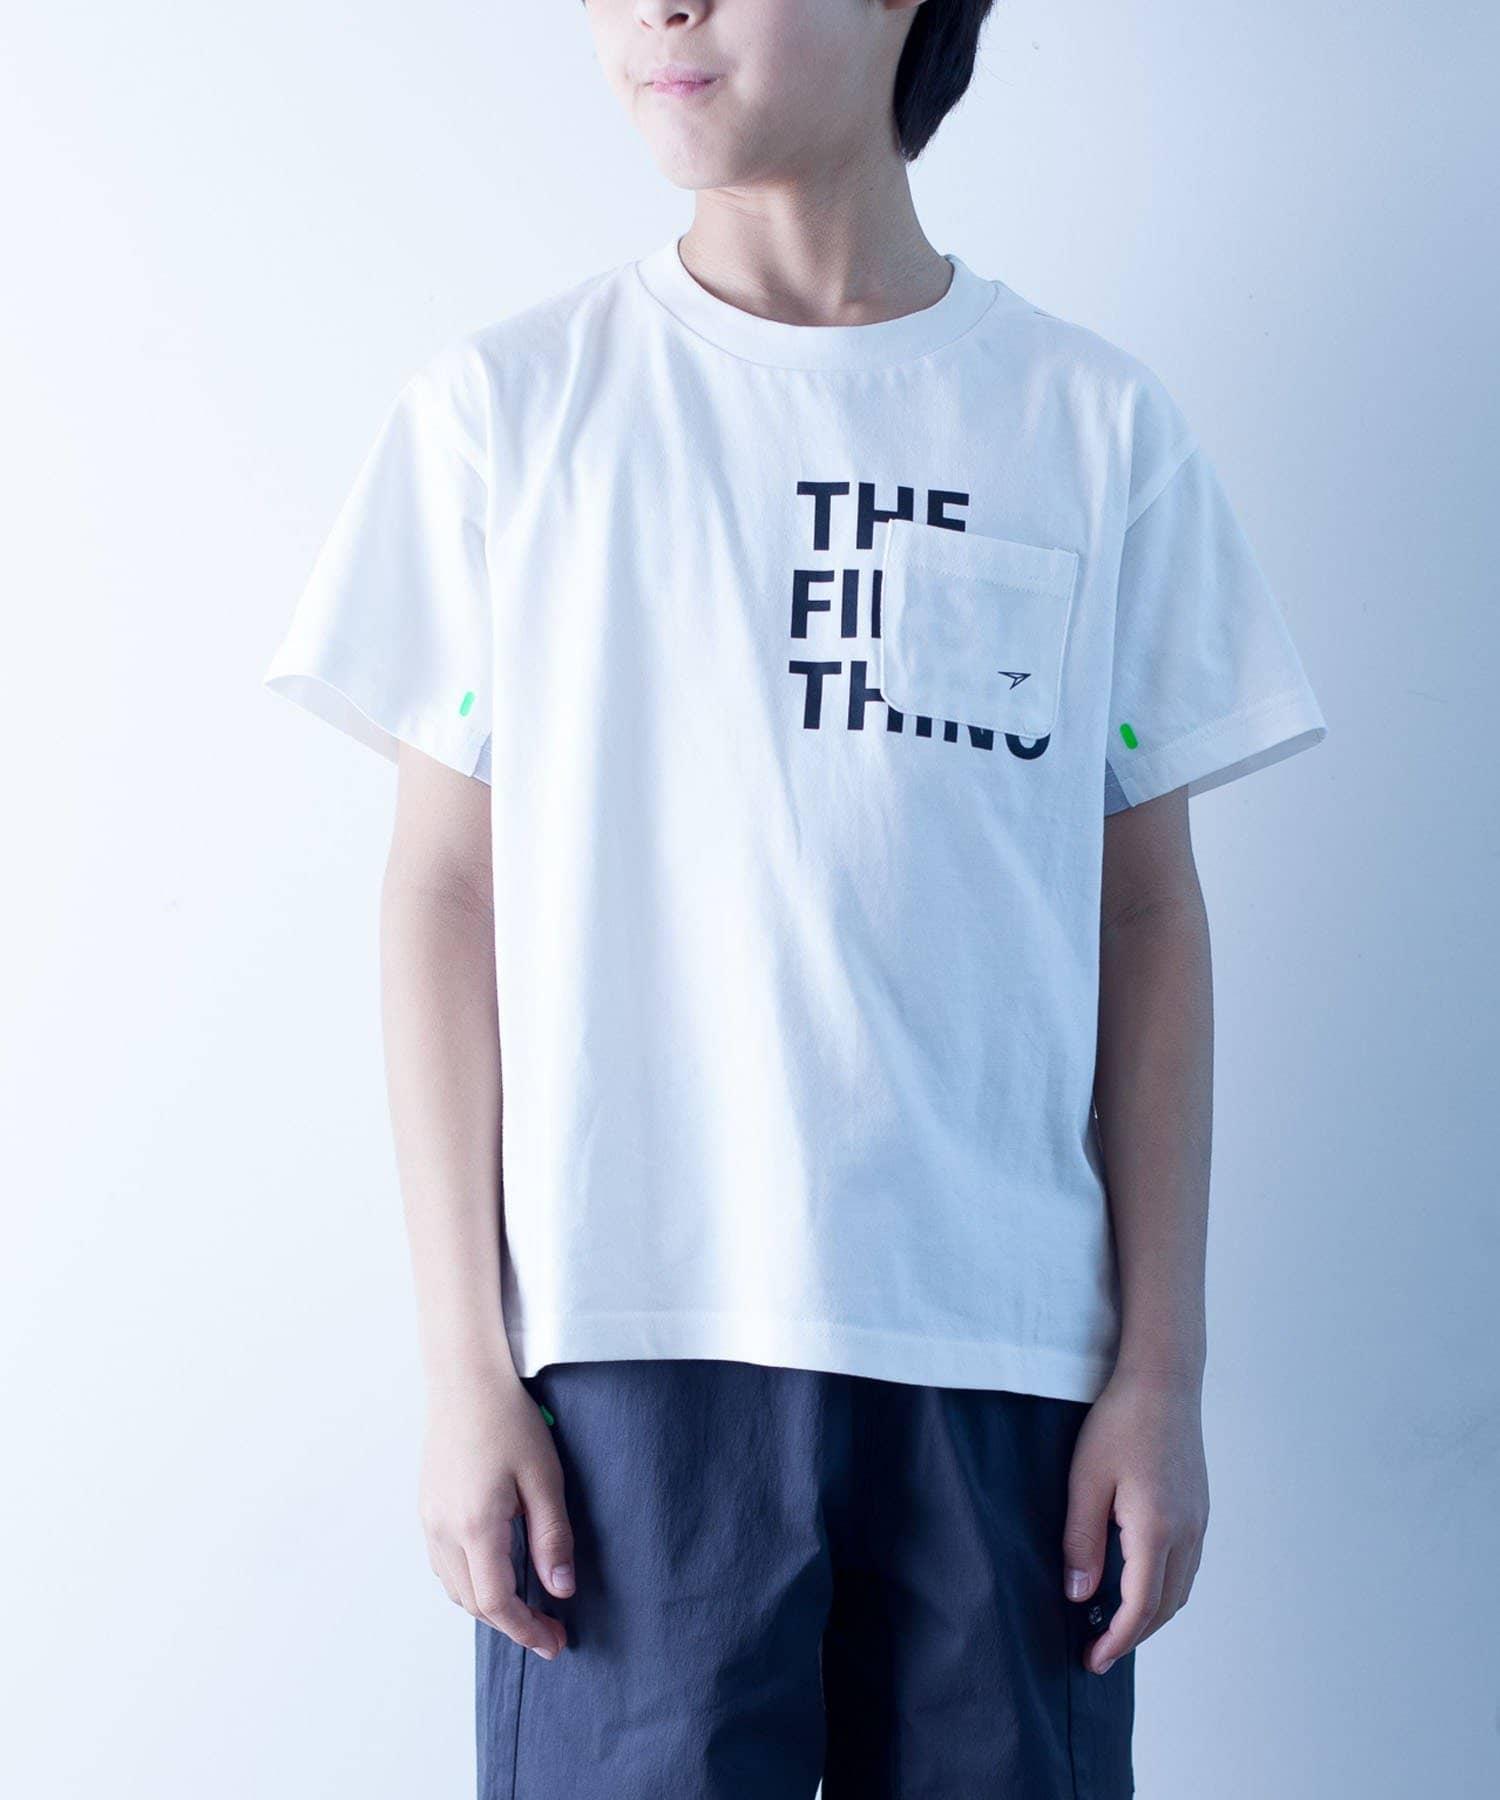 CIAOPANIC TYPY(チャオパニックティピー) キッズ 【KIDS】【瞬足】シルケット天竺ポケットTee エクリュ